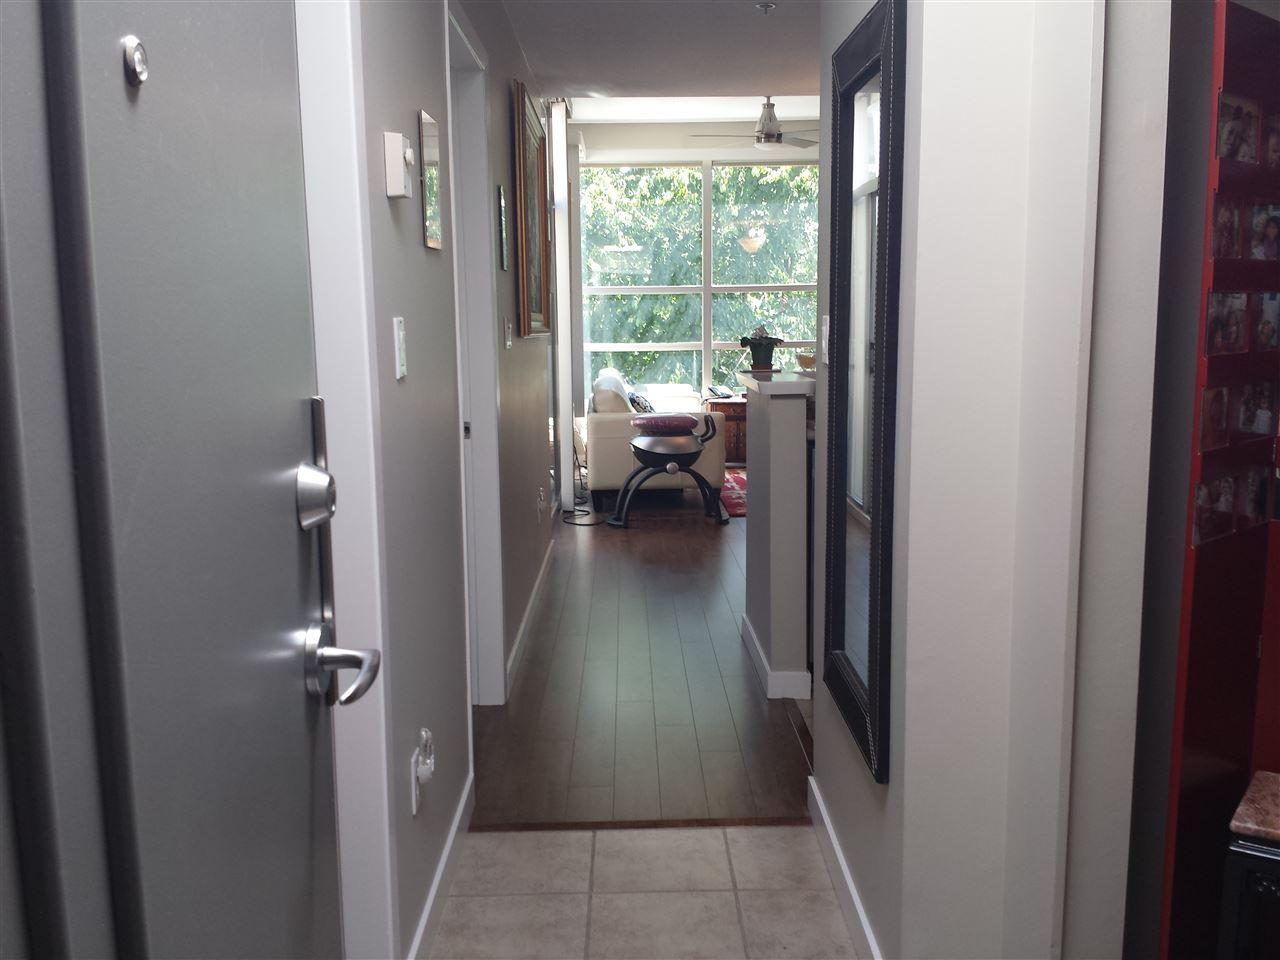 "Photo 12: Photos: 406 2983 W 4TH Avenue in Vancouver: Kitsilano Condo for sale in ""DELANO"" (Vancouver West)  : MLS®# R2189122"